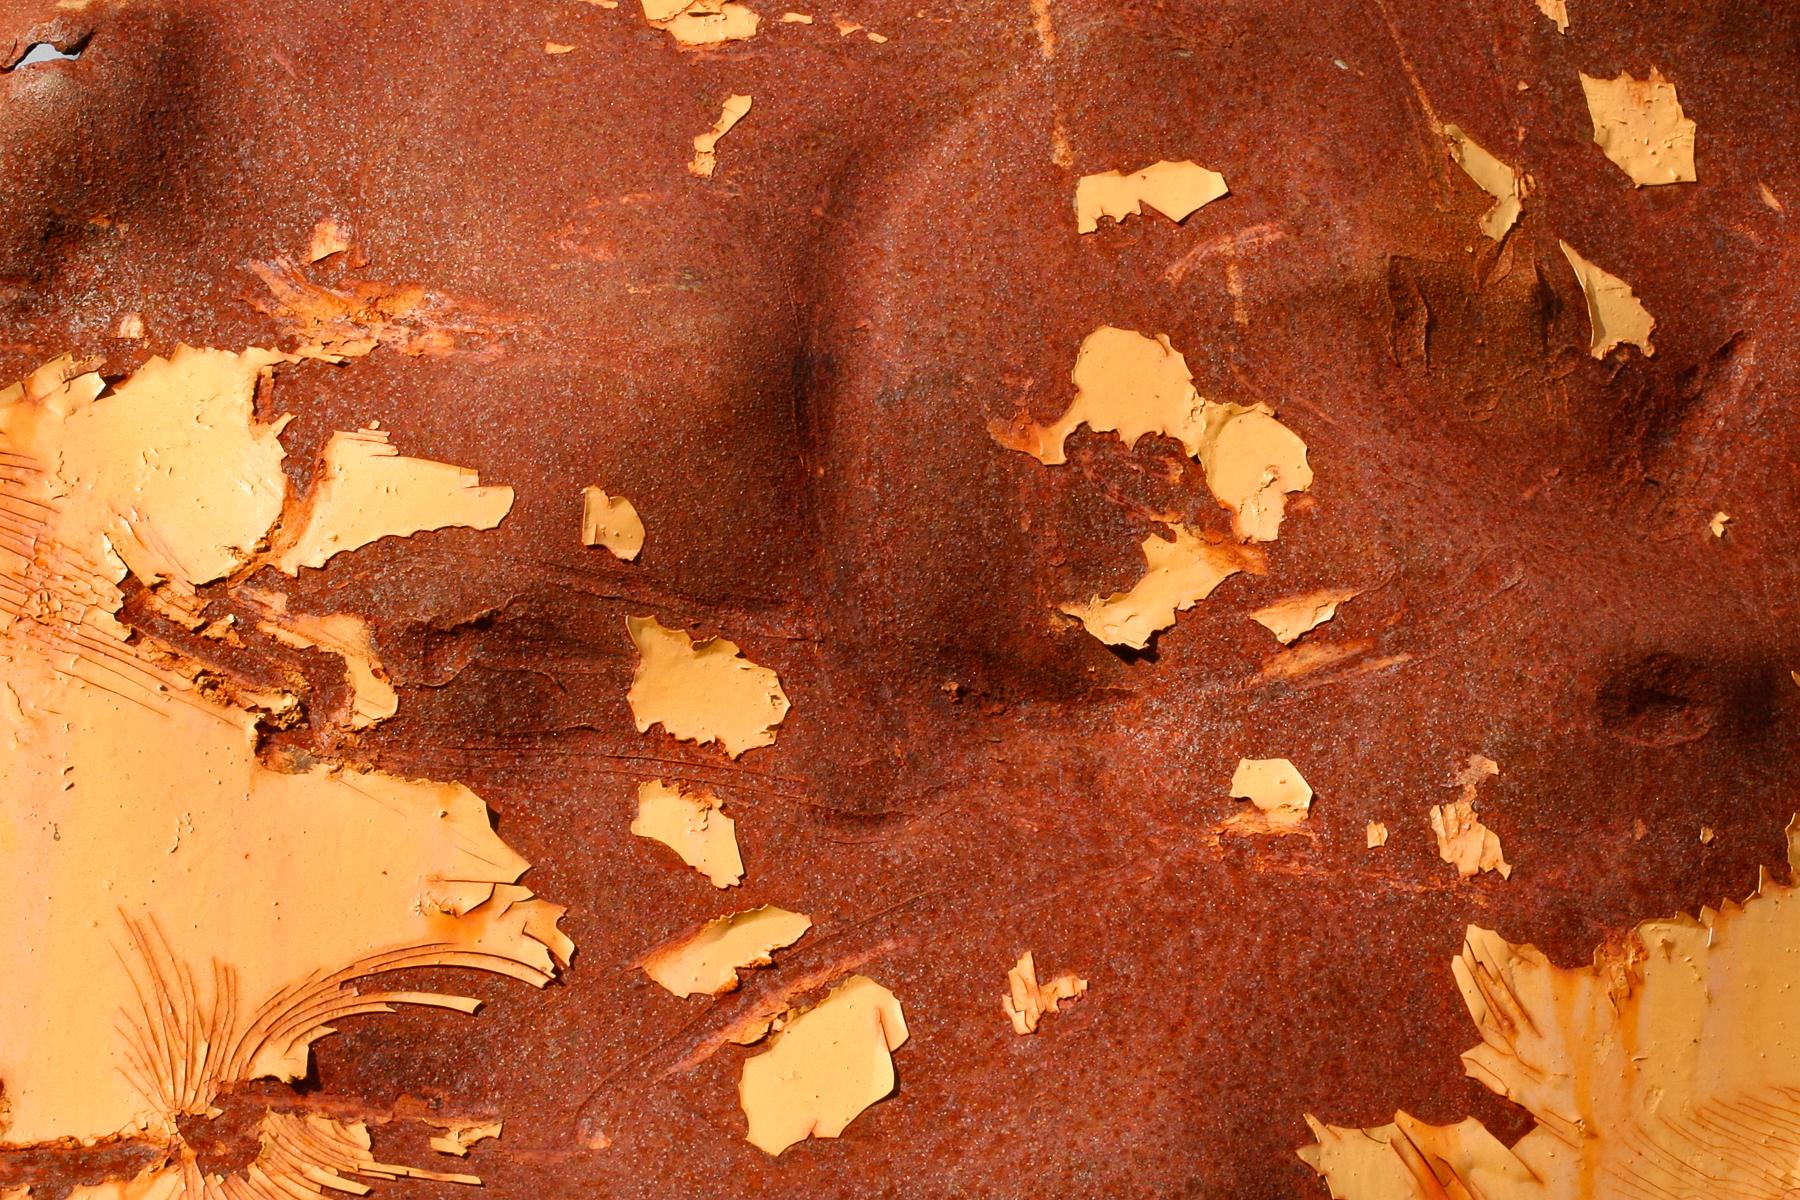 Rusty grunge texture photo